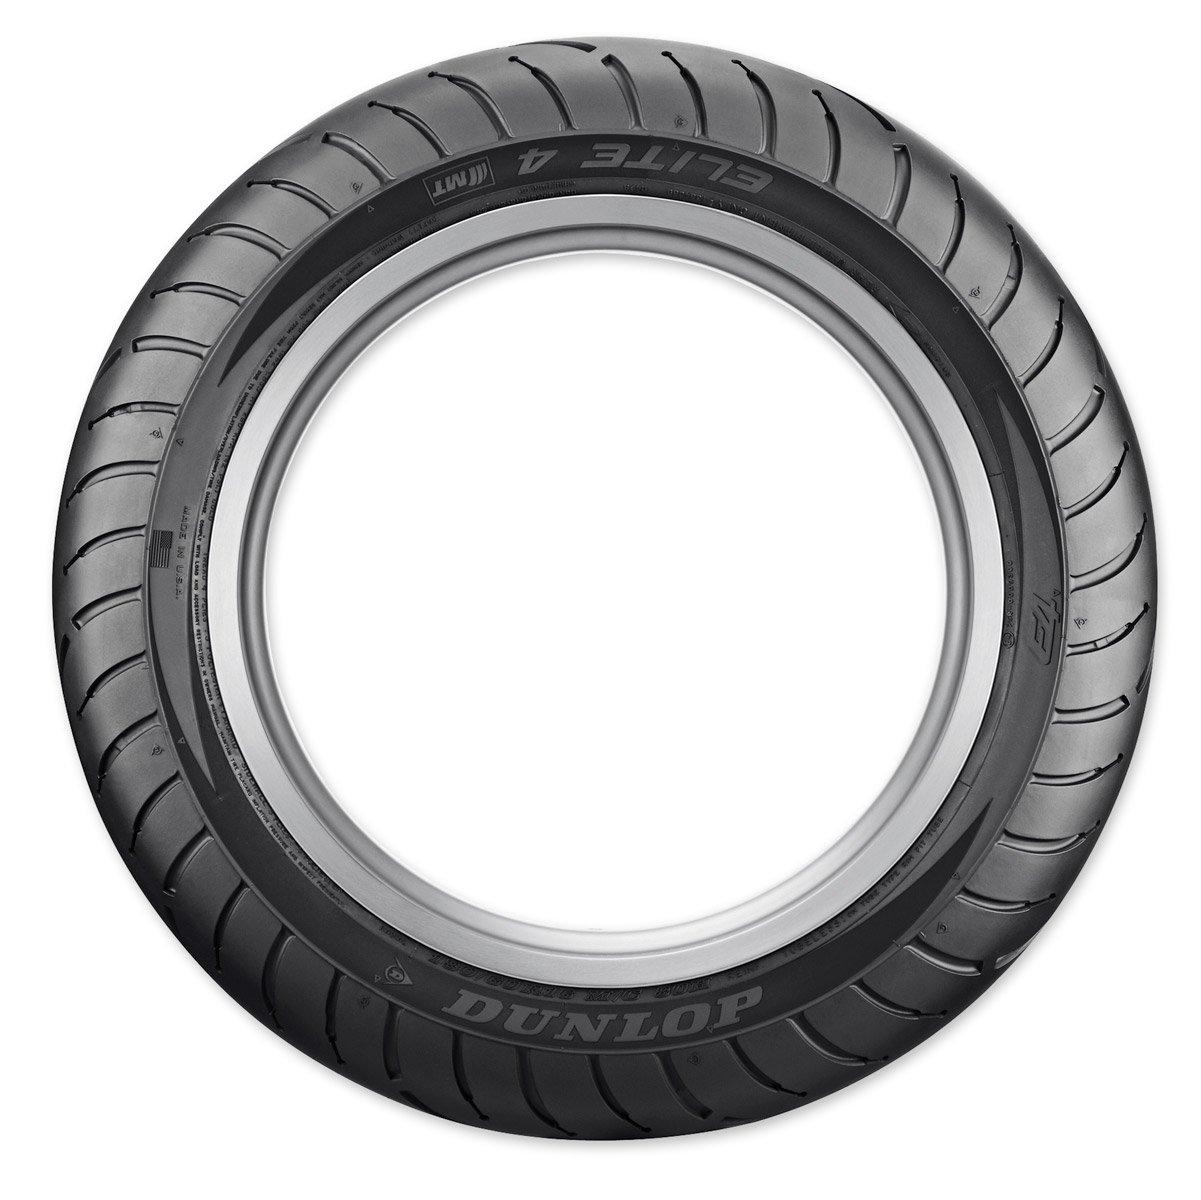 180//60R16 Dunlop Elite 4 Radial